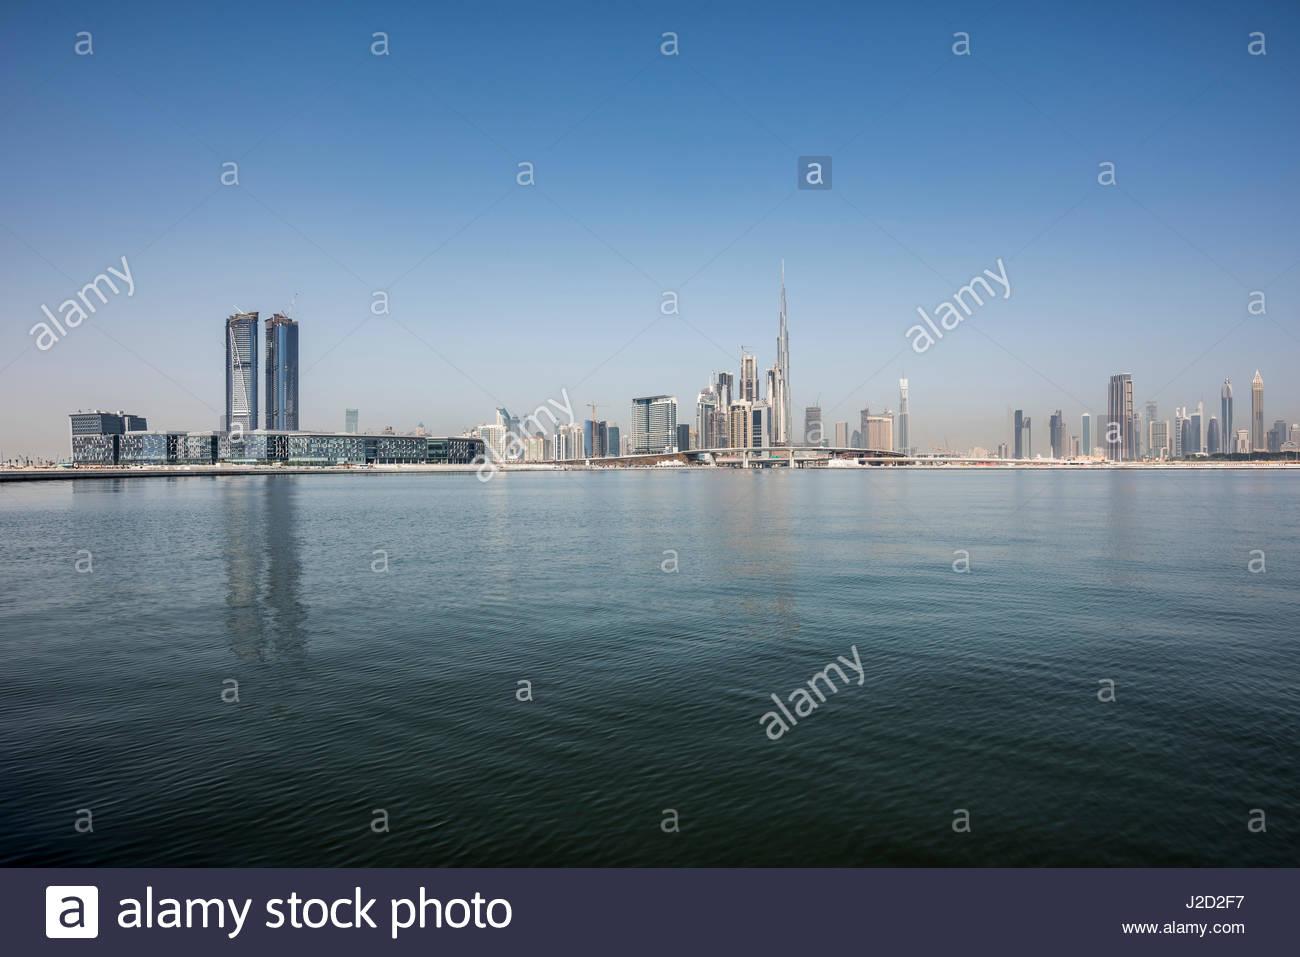 Dubai Skyline with the water canal, Dubai Design district (left) and Burj Khalifa the iconic skyscraper, Ras Al - Stock Image